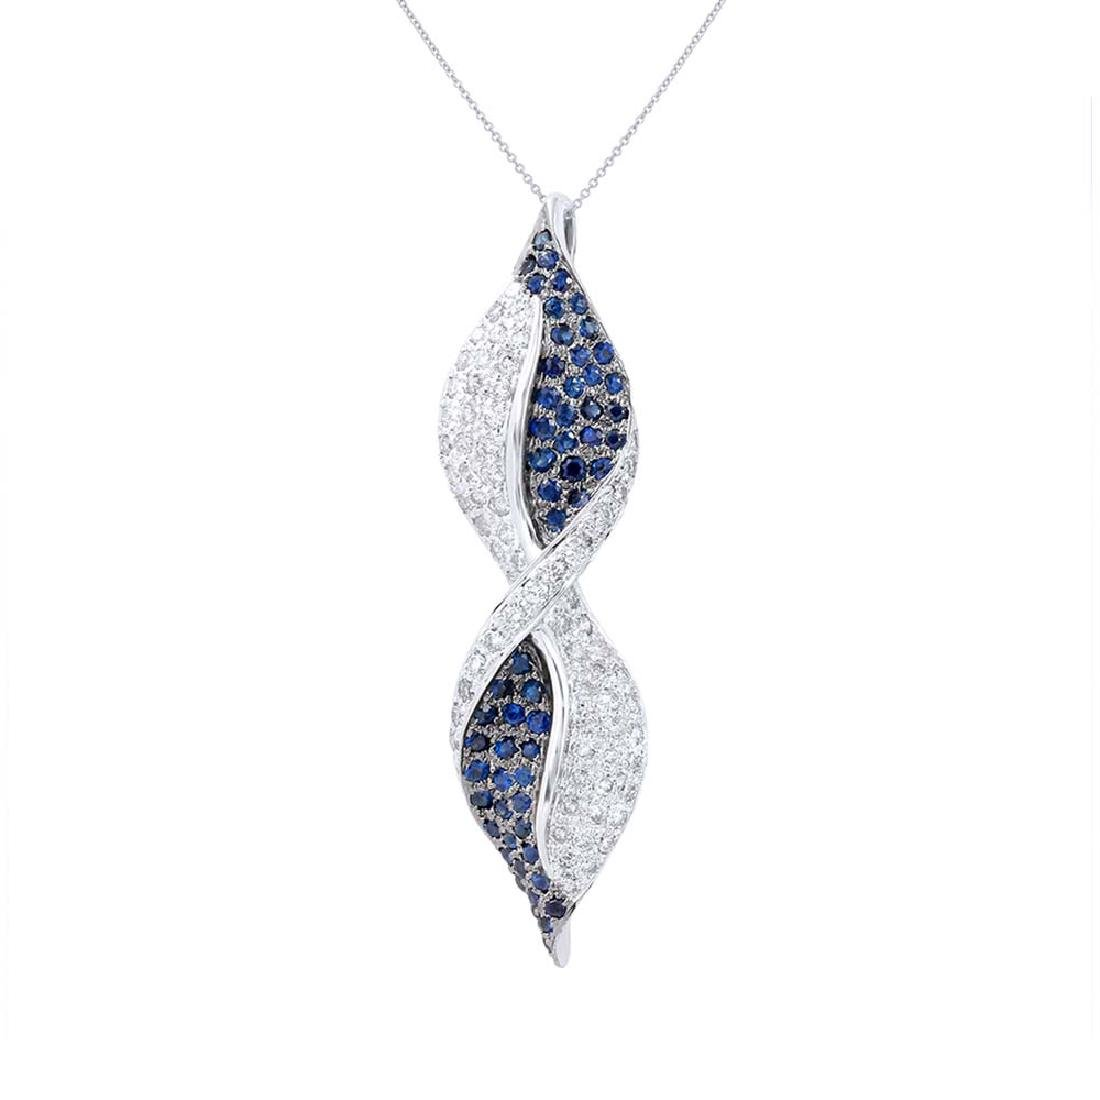 Genuine 2.04 TCW 14K White Gold Ladies Necklace